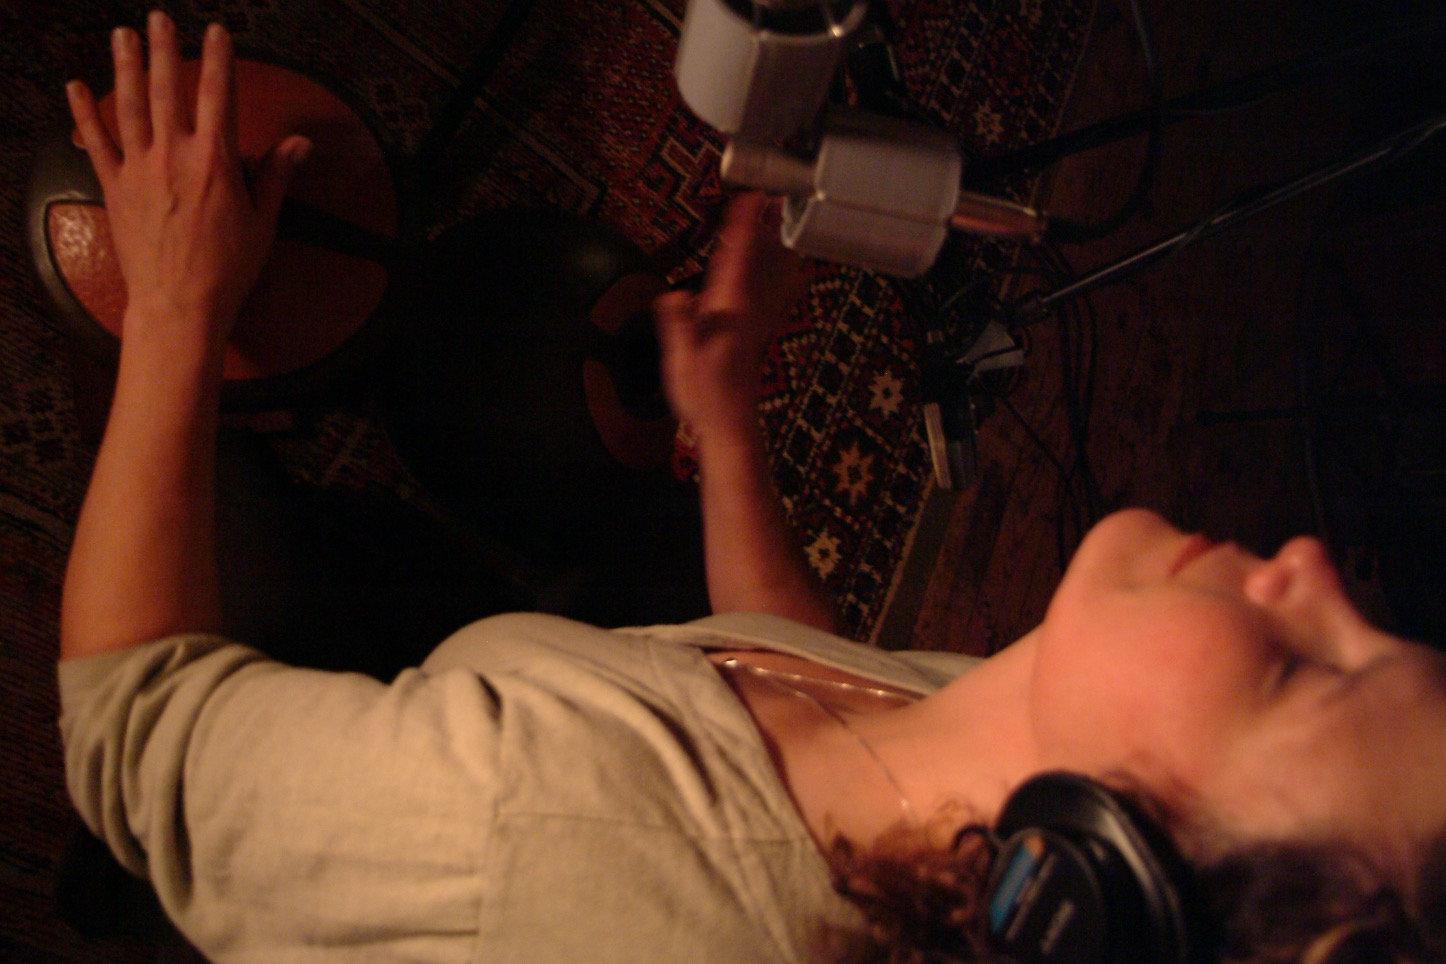 Music Production/Recording